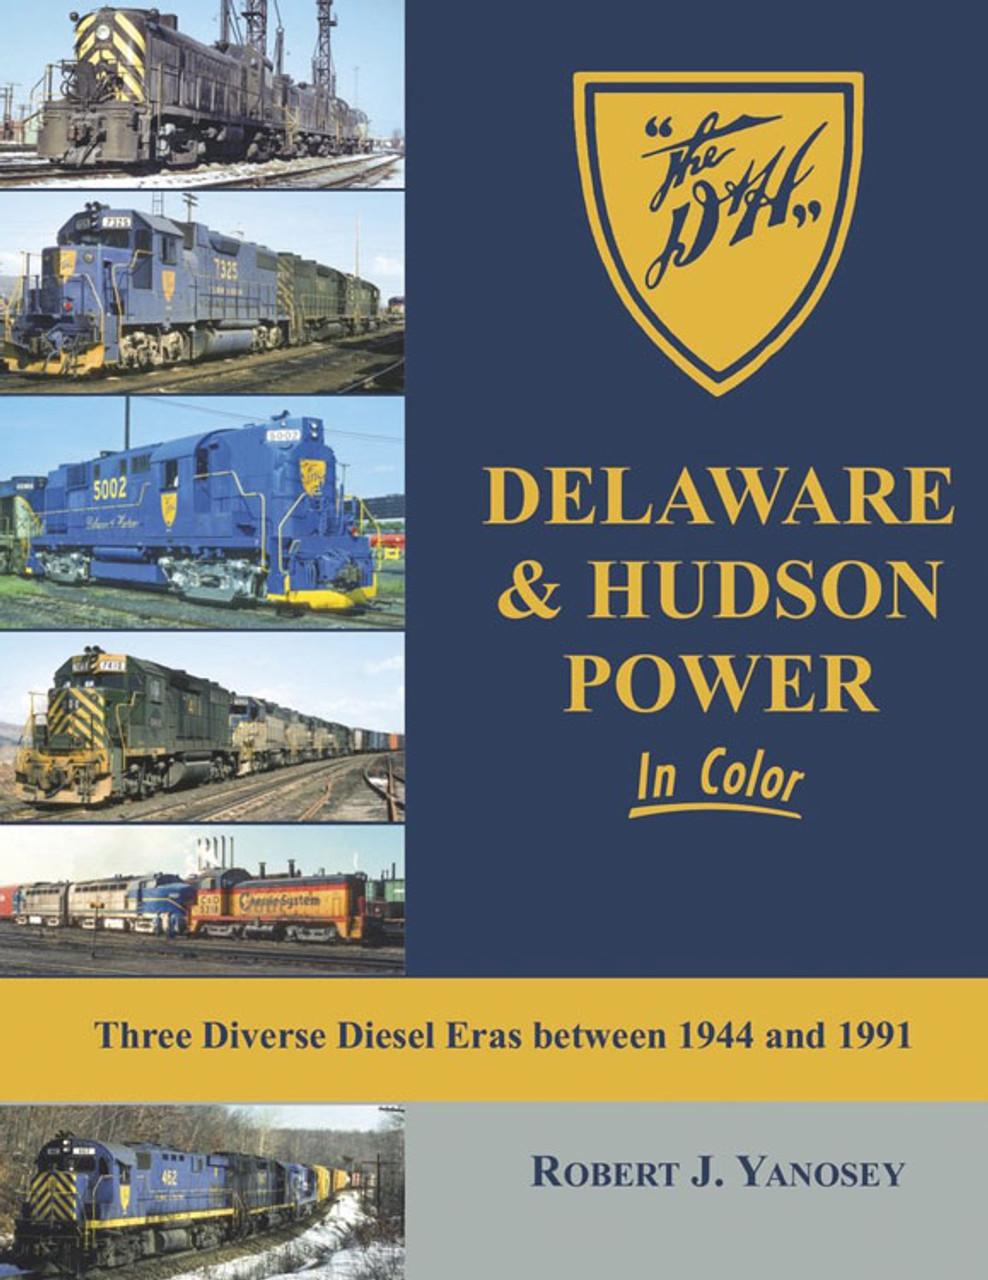 Delaware & Hudson Power in Color -- Three Diverse Diesel Eras between 1944 and 1991